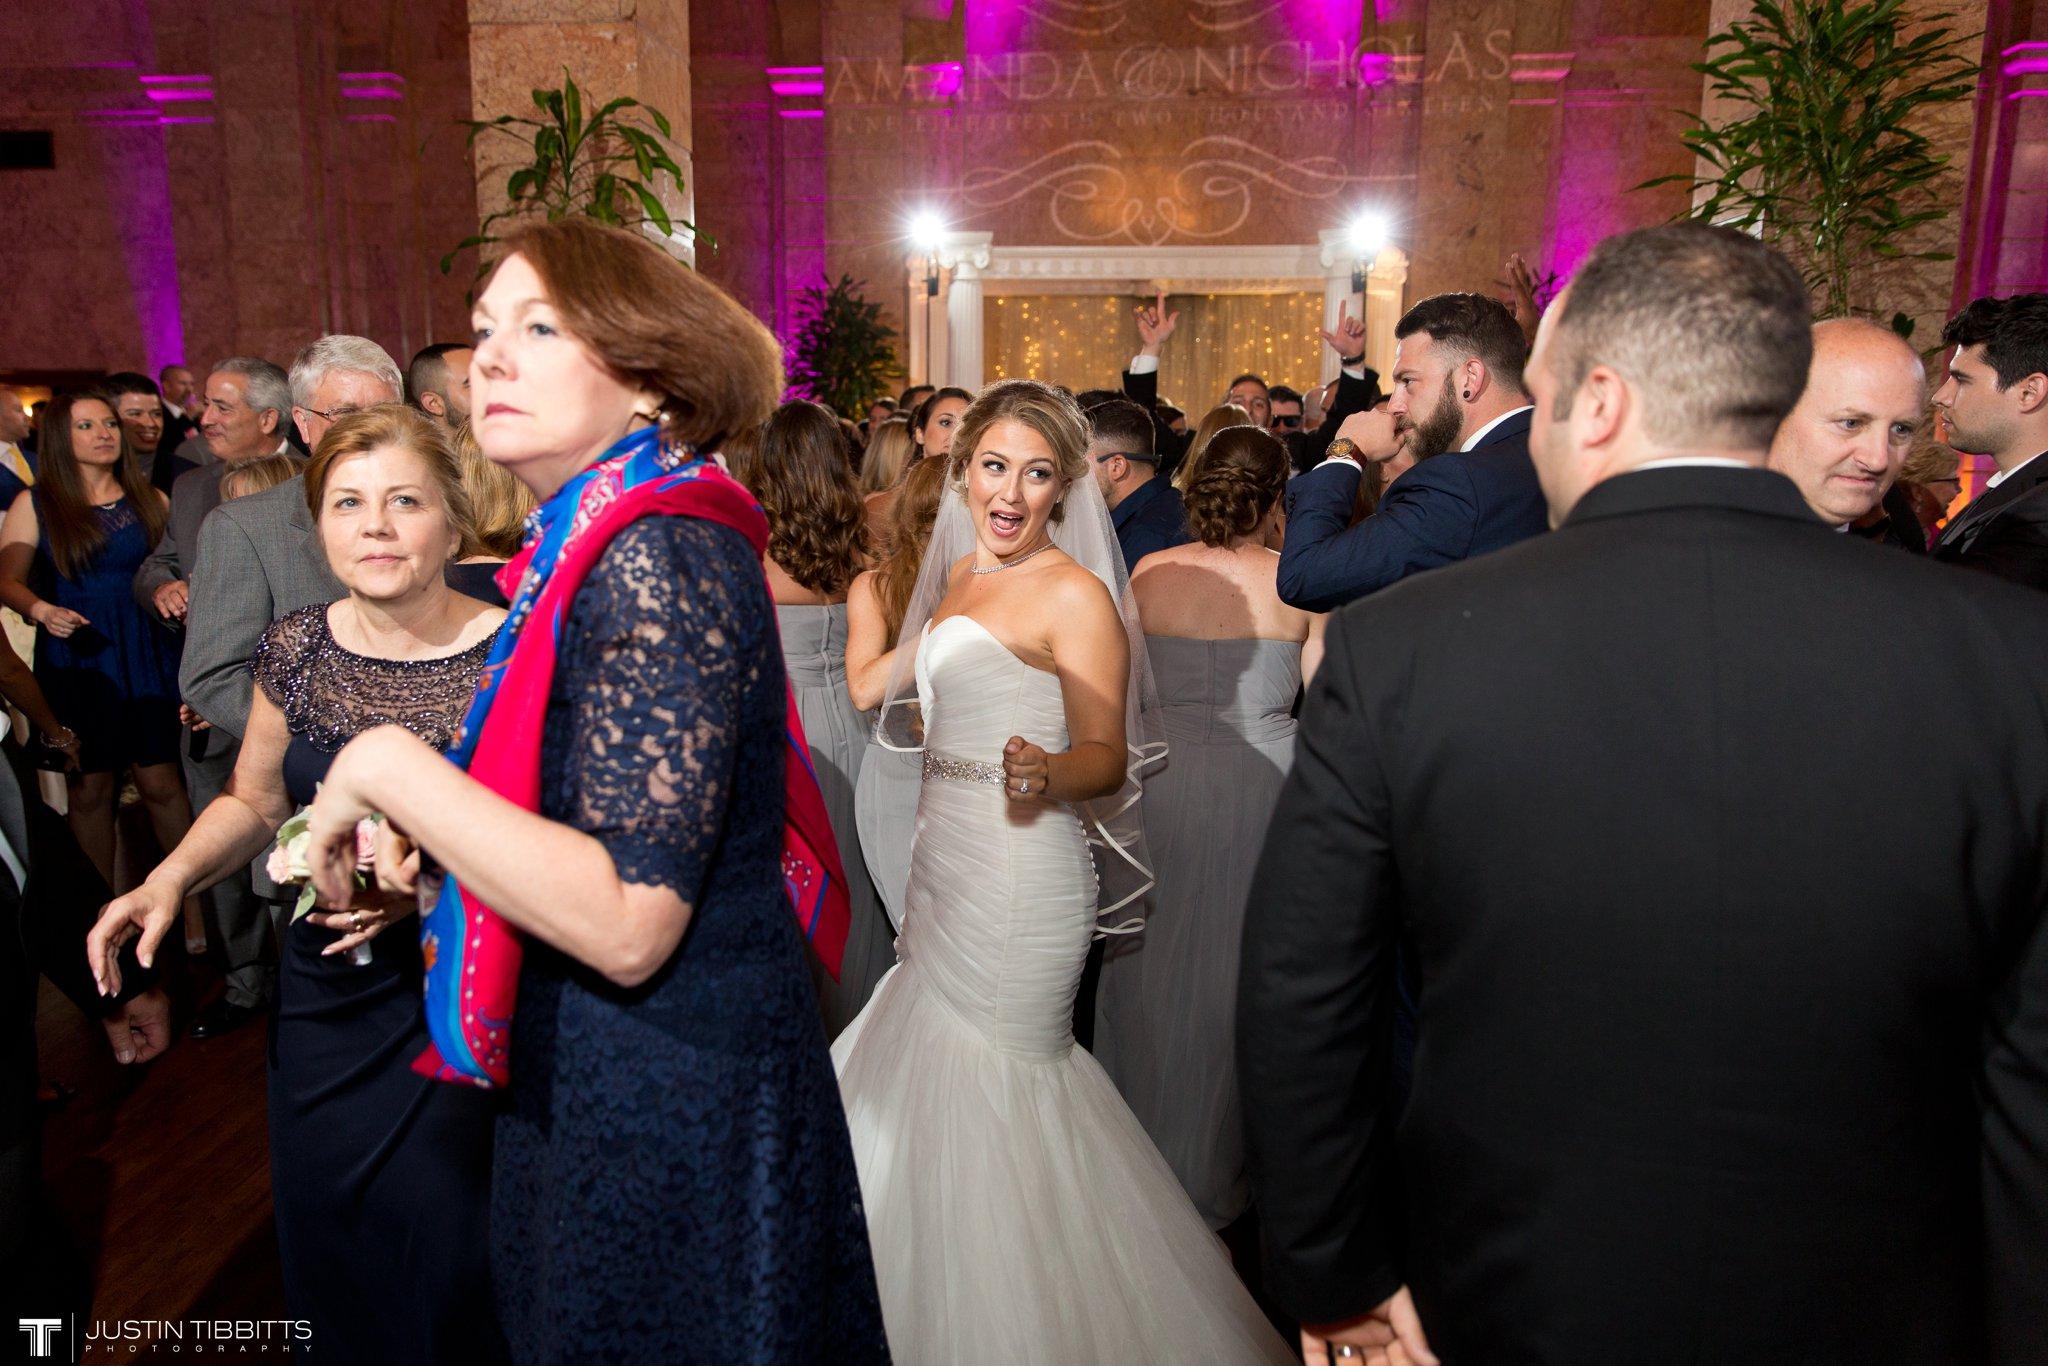 state-room-wedding-photos-with-amanda-and-nick_0152